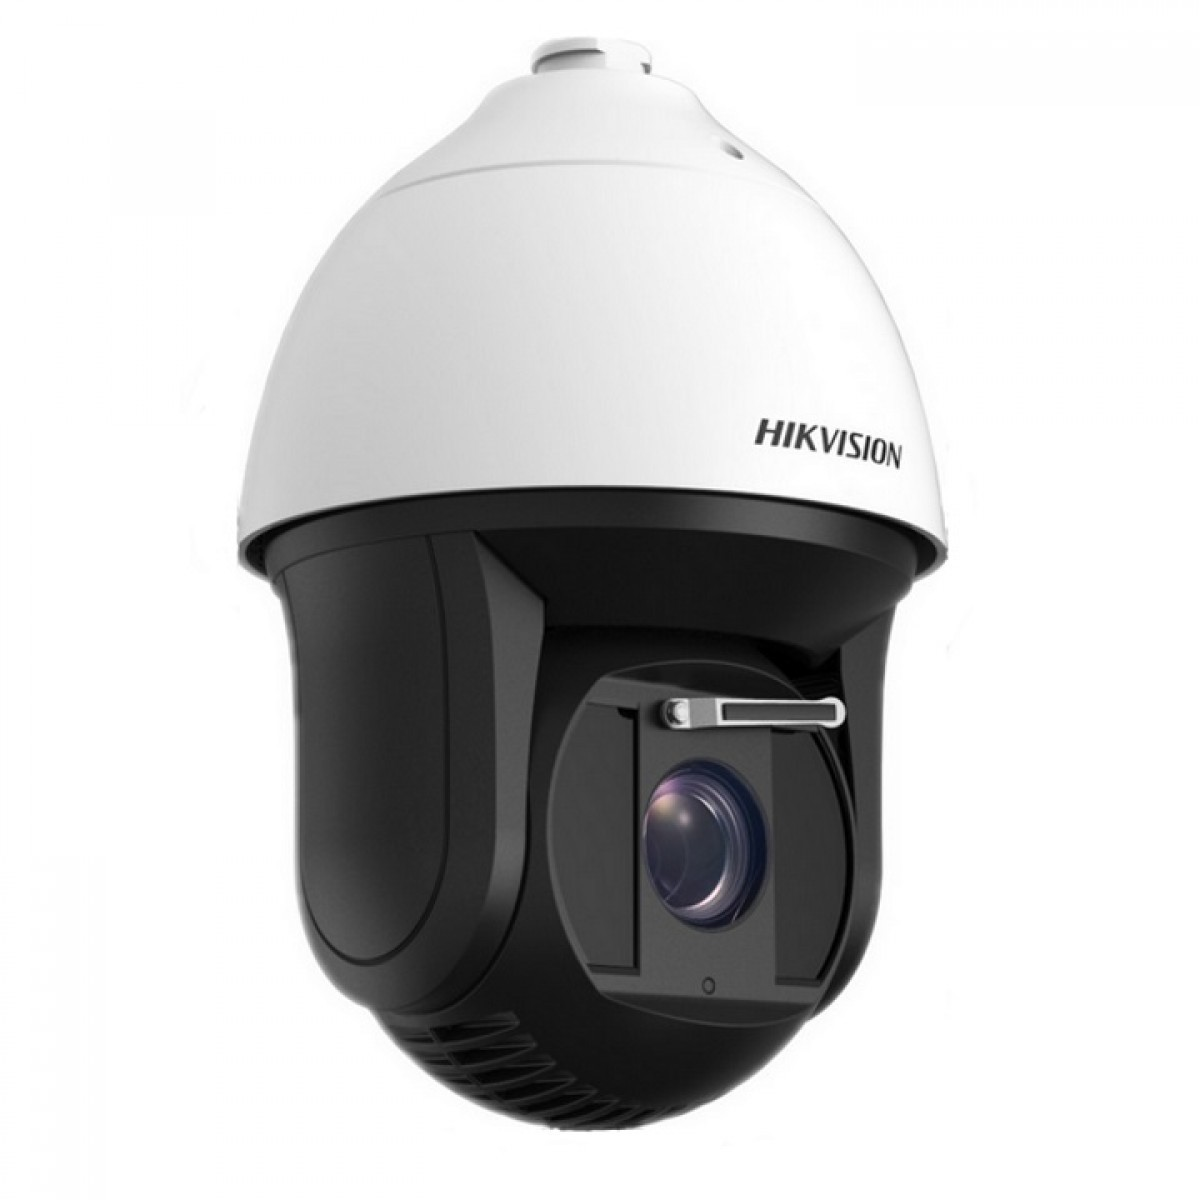 Hikvision DS-2DF8236I-AEL PTZ IP Camera 2MP 36x Zoom Full HD 1080P Smart Autotracking 200M IR Darkfighter IP67 Audio Alarm